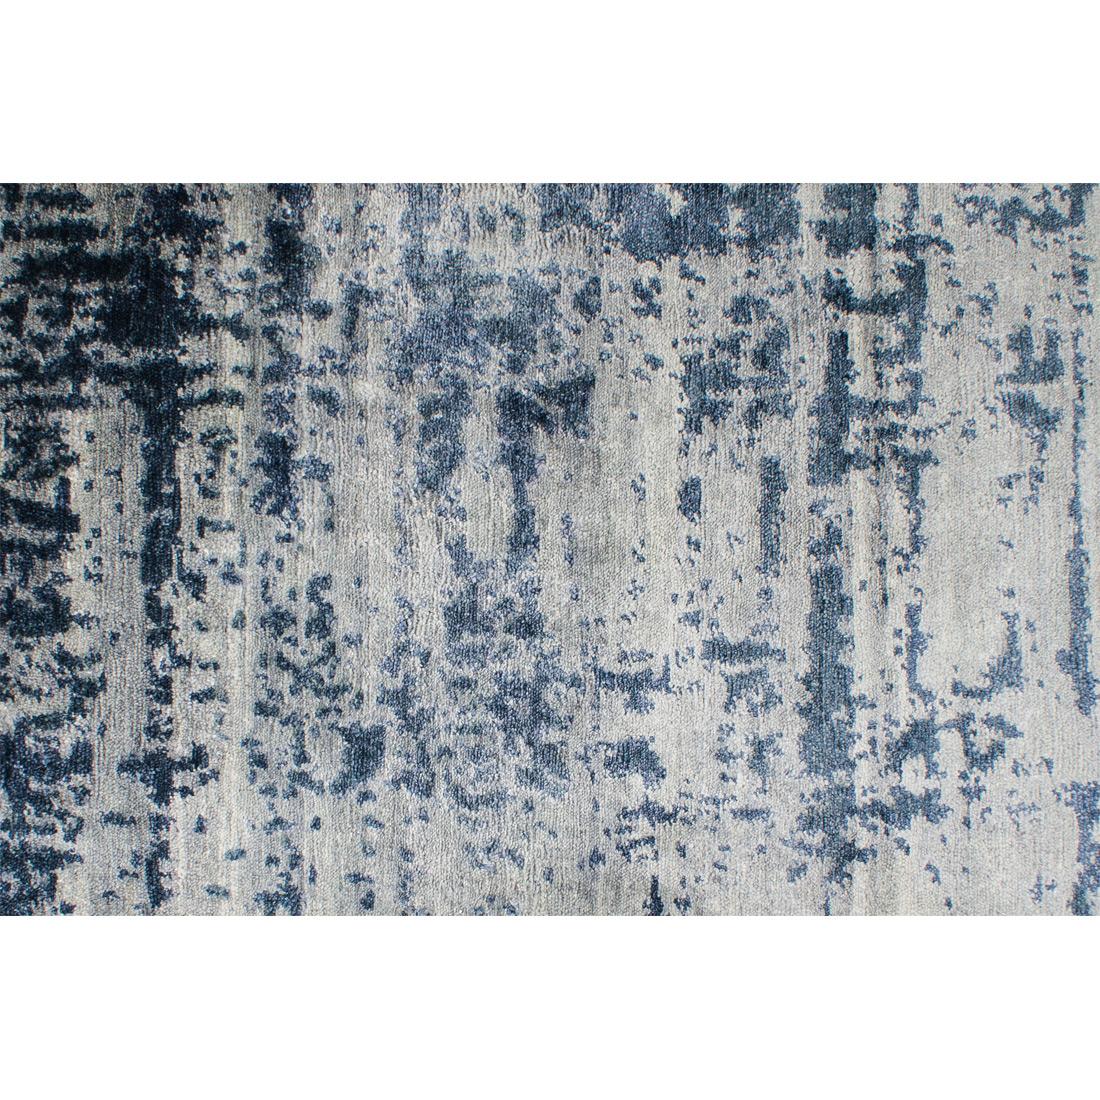 Vloerkleed Xilento Bamboo Grey Blue | 240 x 340 cm